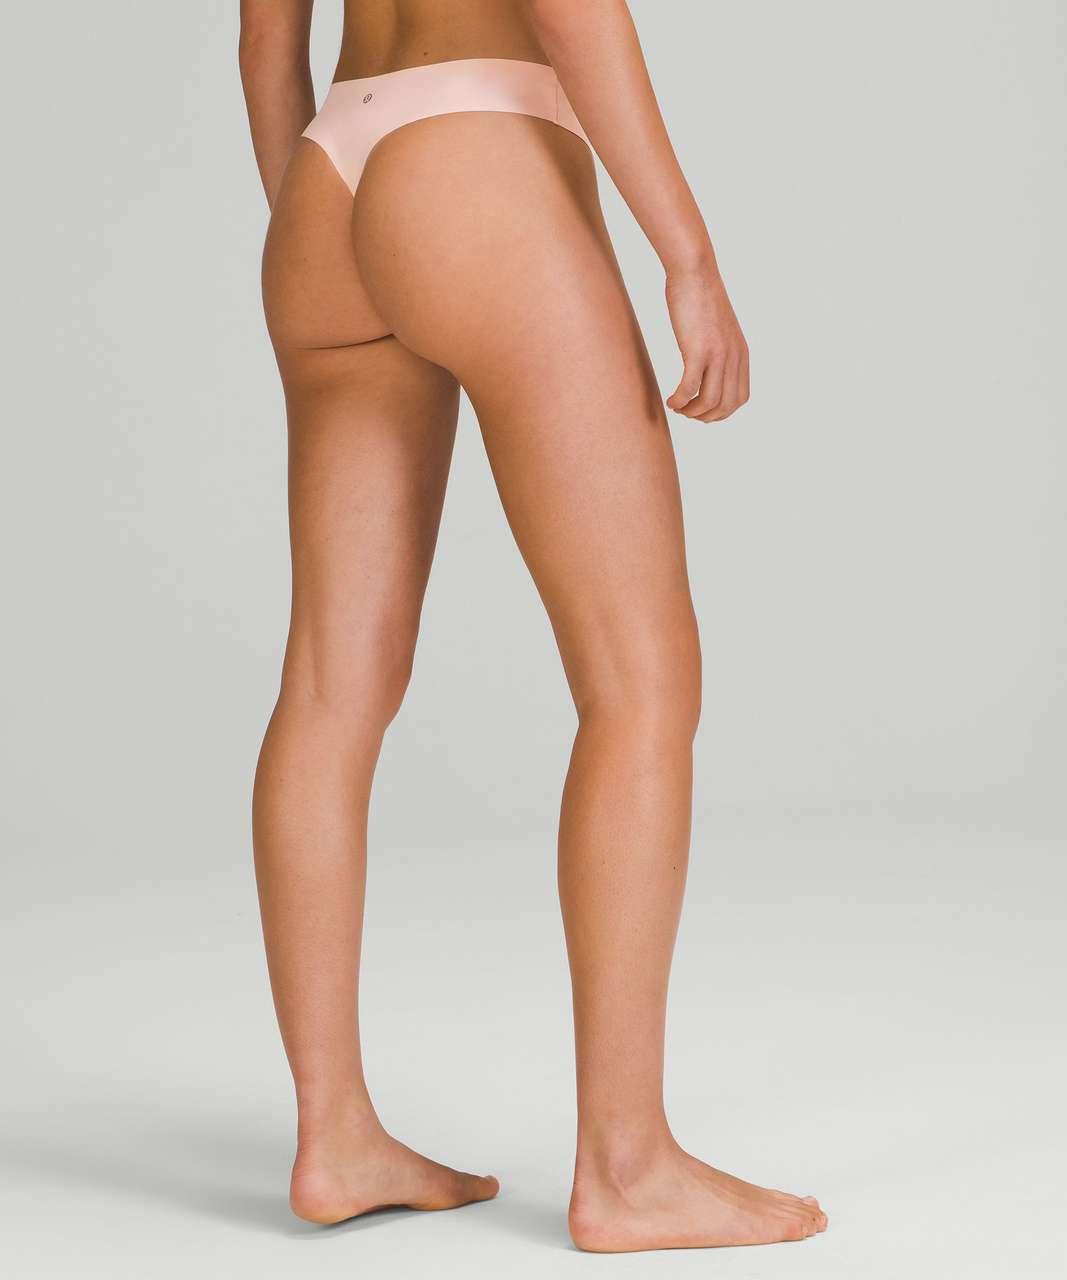 Lululemon InvisiWear Mid Rise Thong Underwear 3 Pack - Heritage 365 Camo Mini Rotated Pecan Tan Multi / Pink Mist / Black